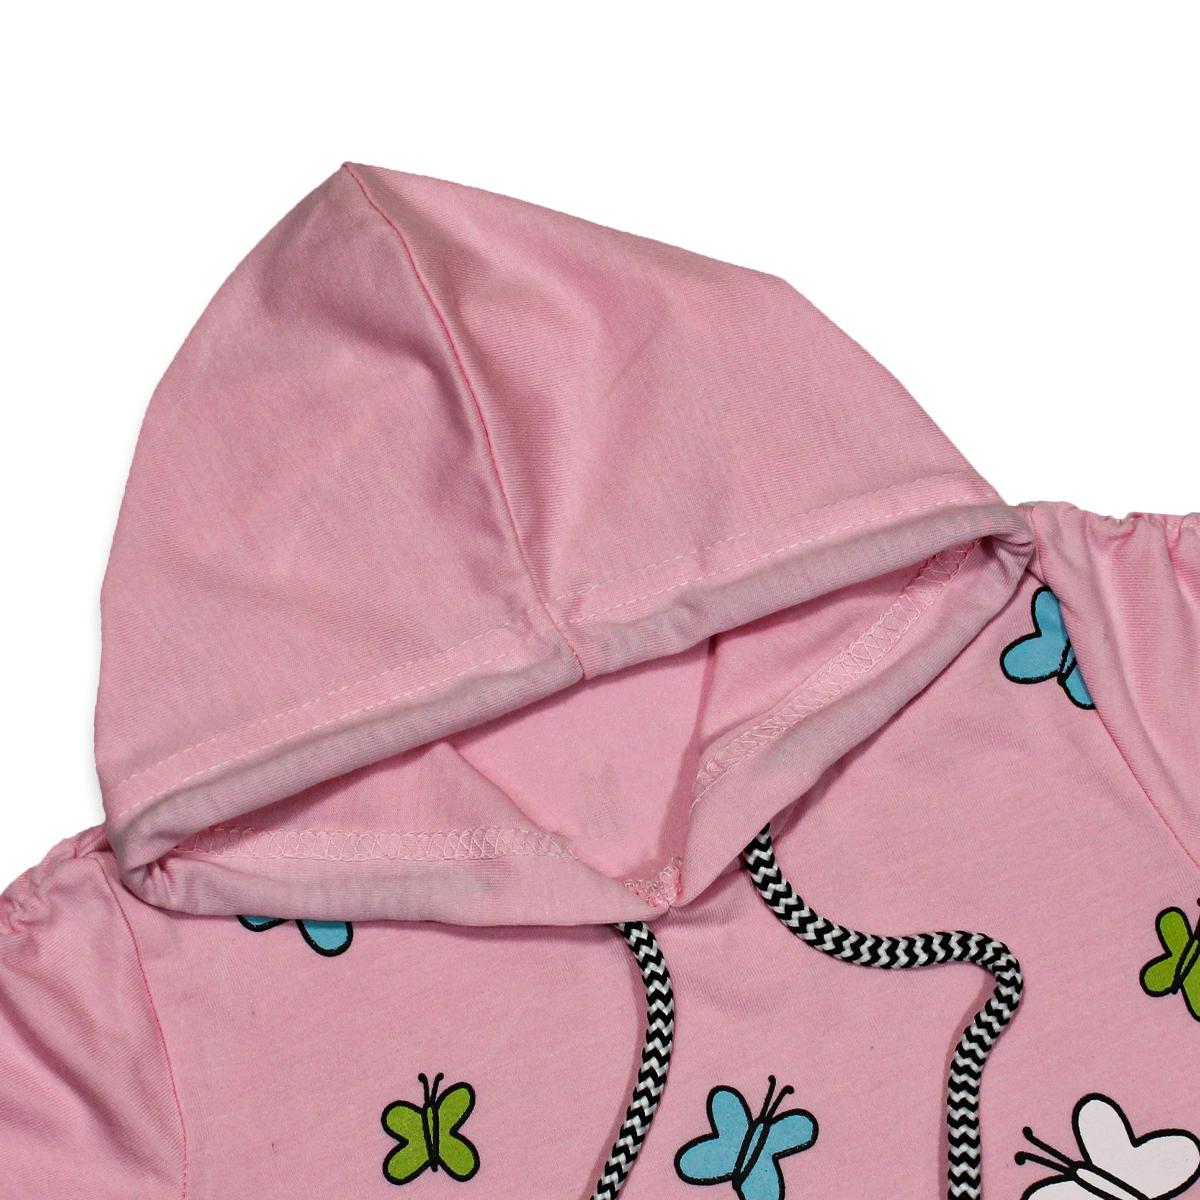 Cut Price 2.5yrs - 7yrs Hoodie T-shirt For Girls Cycle